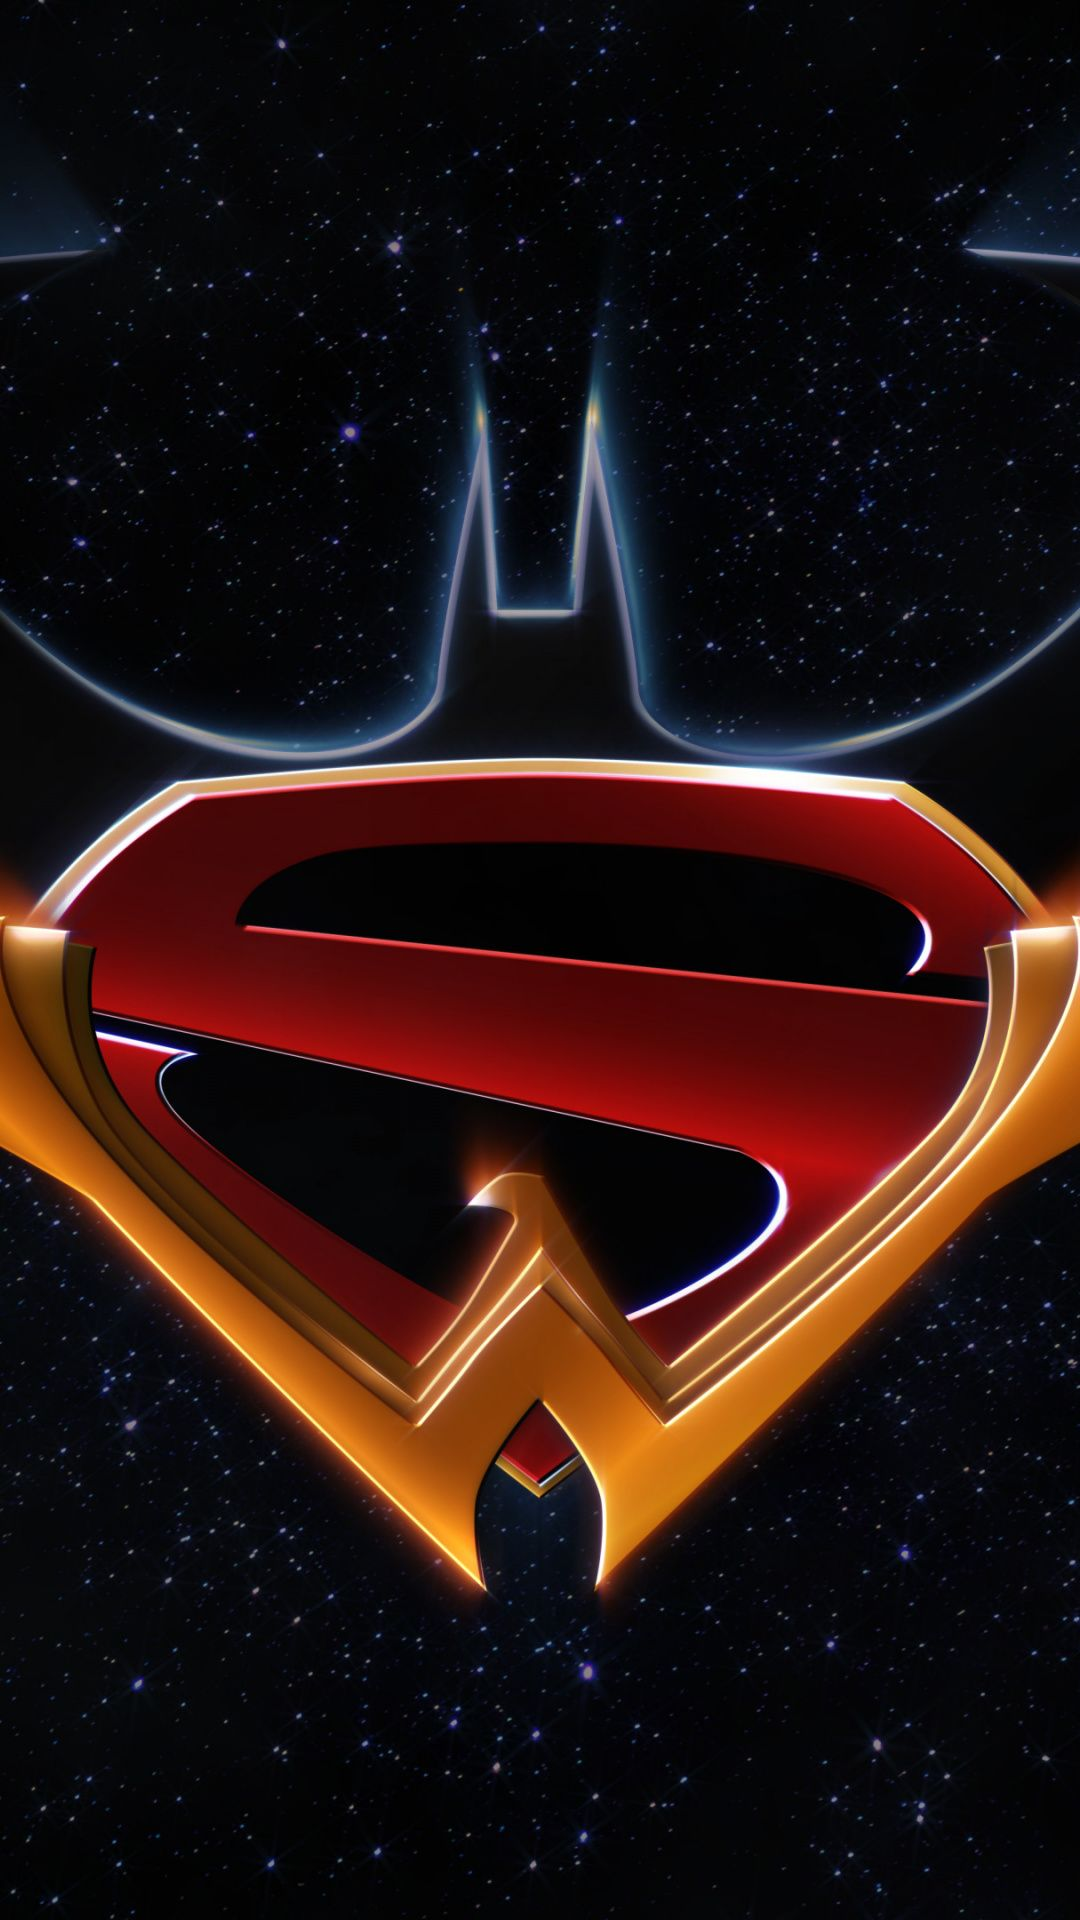 Logo, batman, superman, wonder woman, DC comics wallpaper